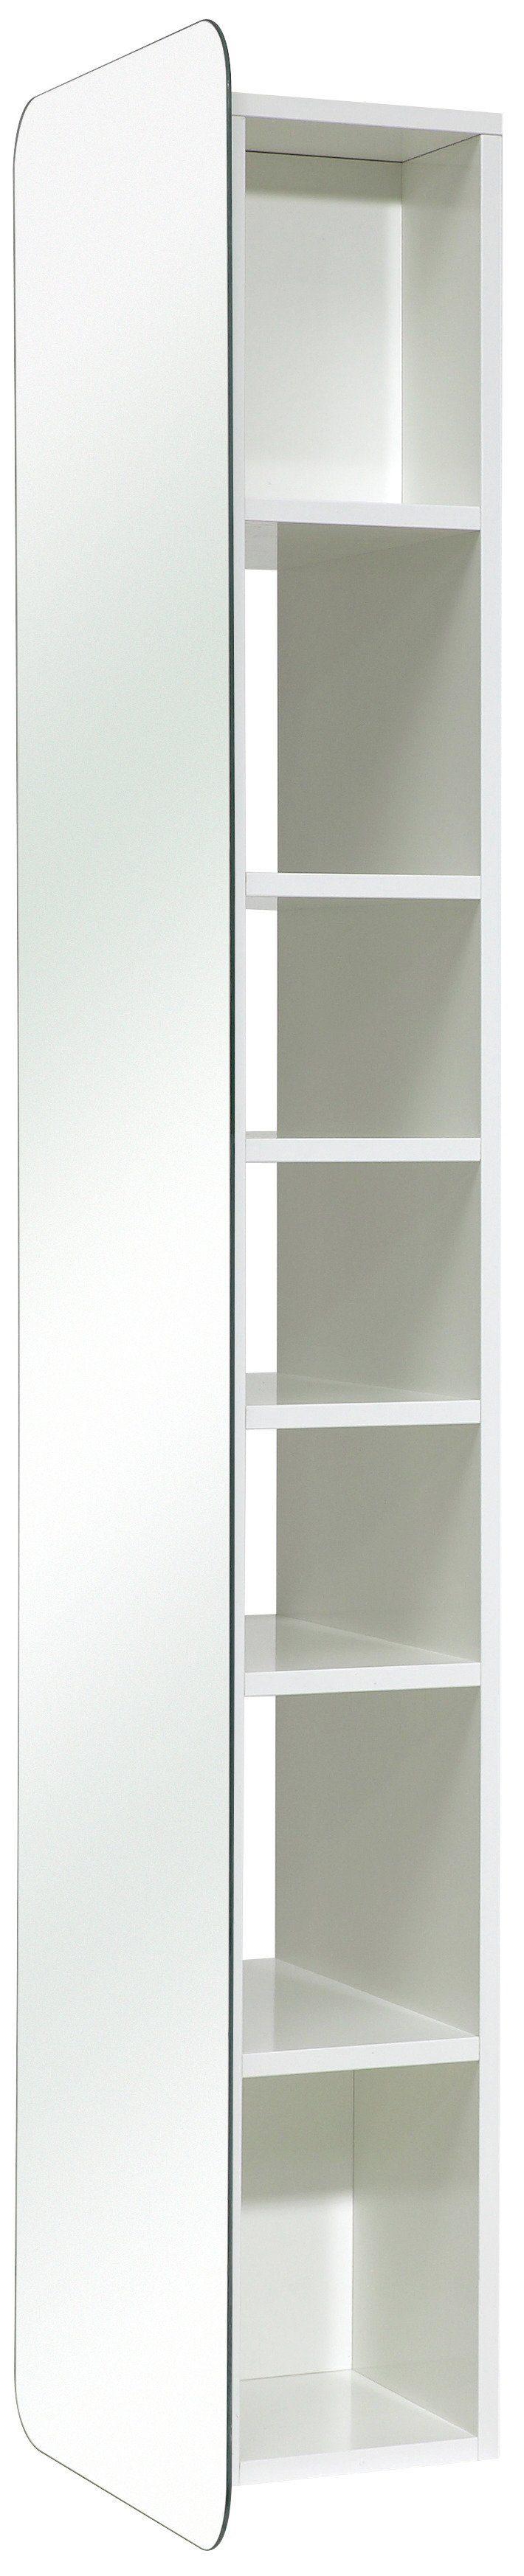 PELIPAL Regal »Solitaire 6005«